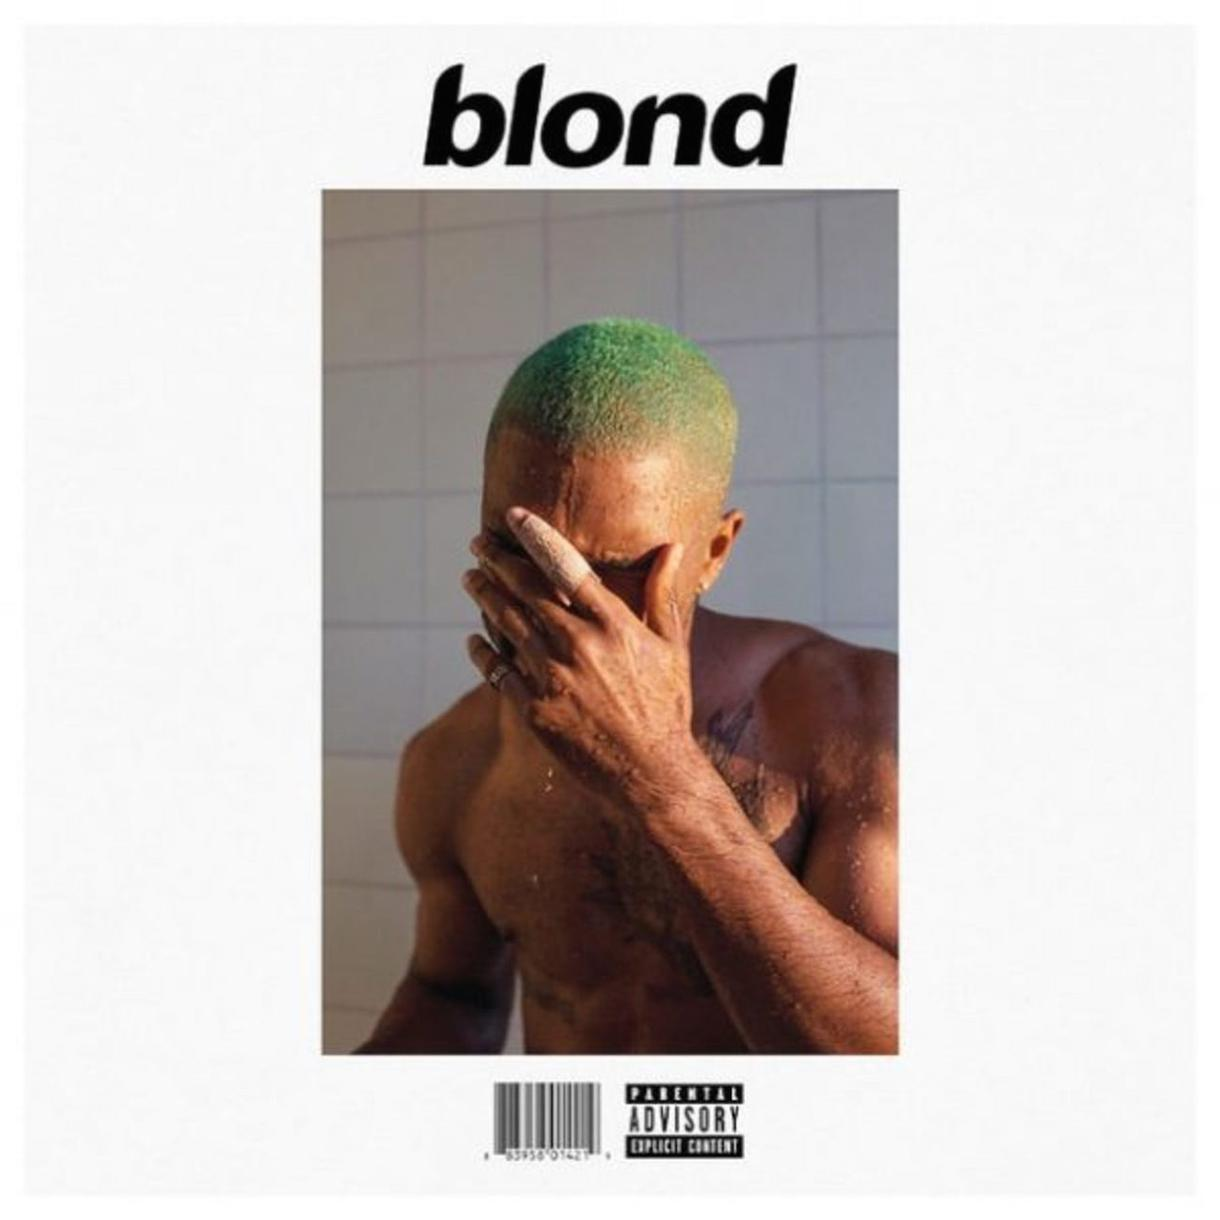 Orange pop records s profile hear the world s sounds - Blonde Boys Don T Cry